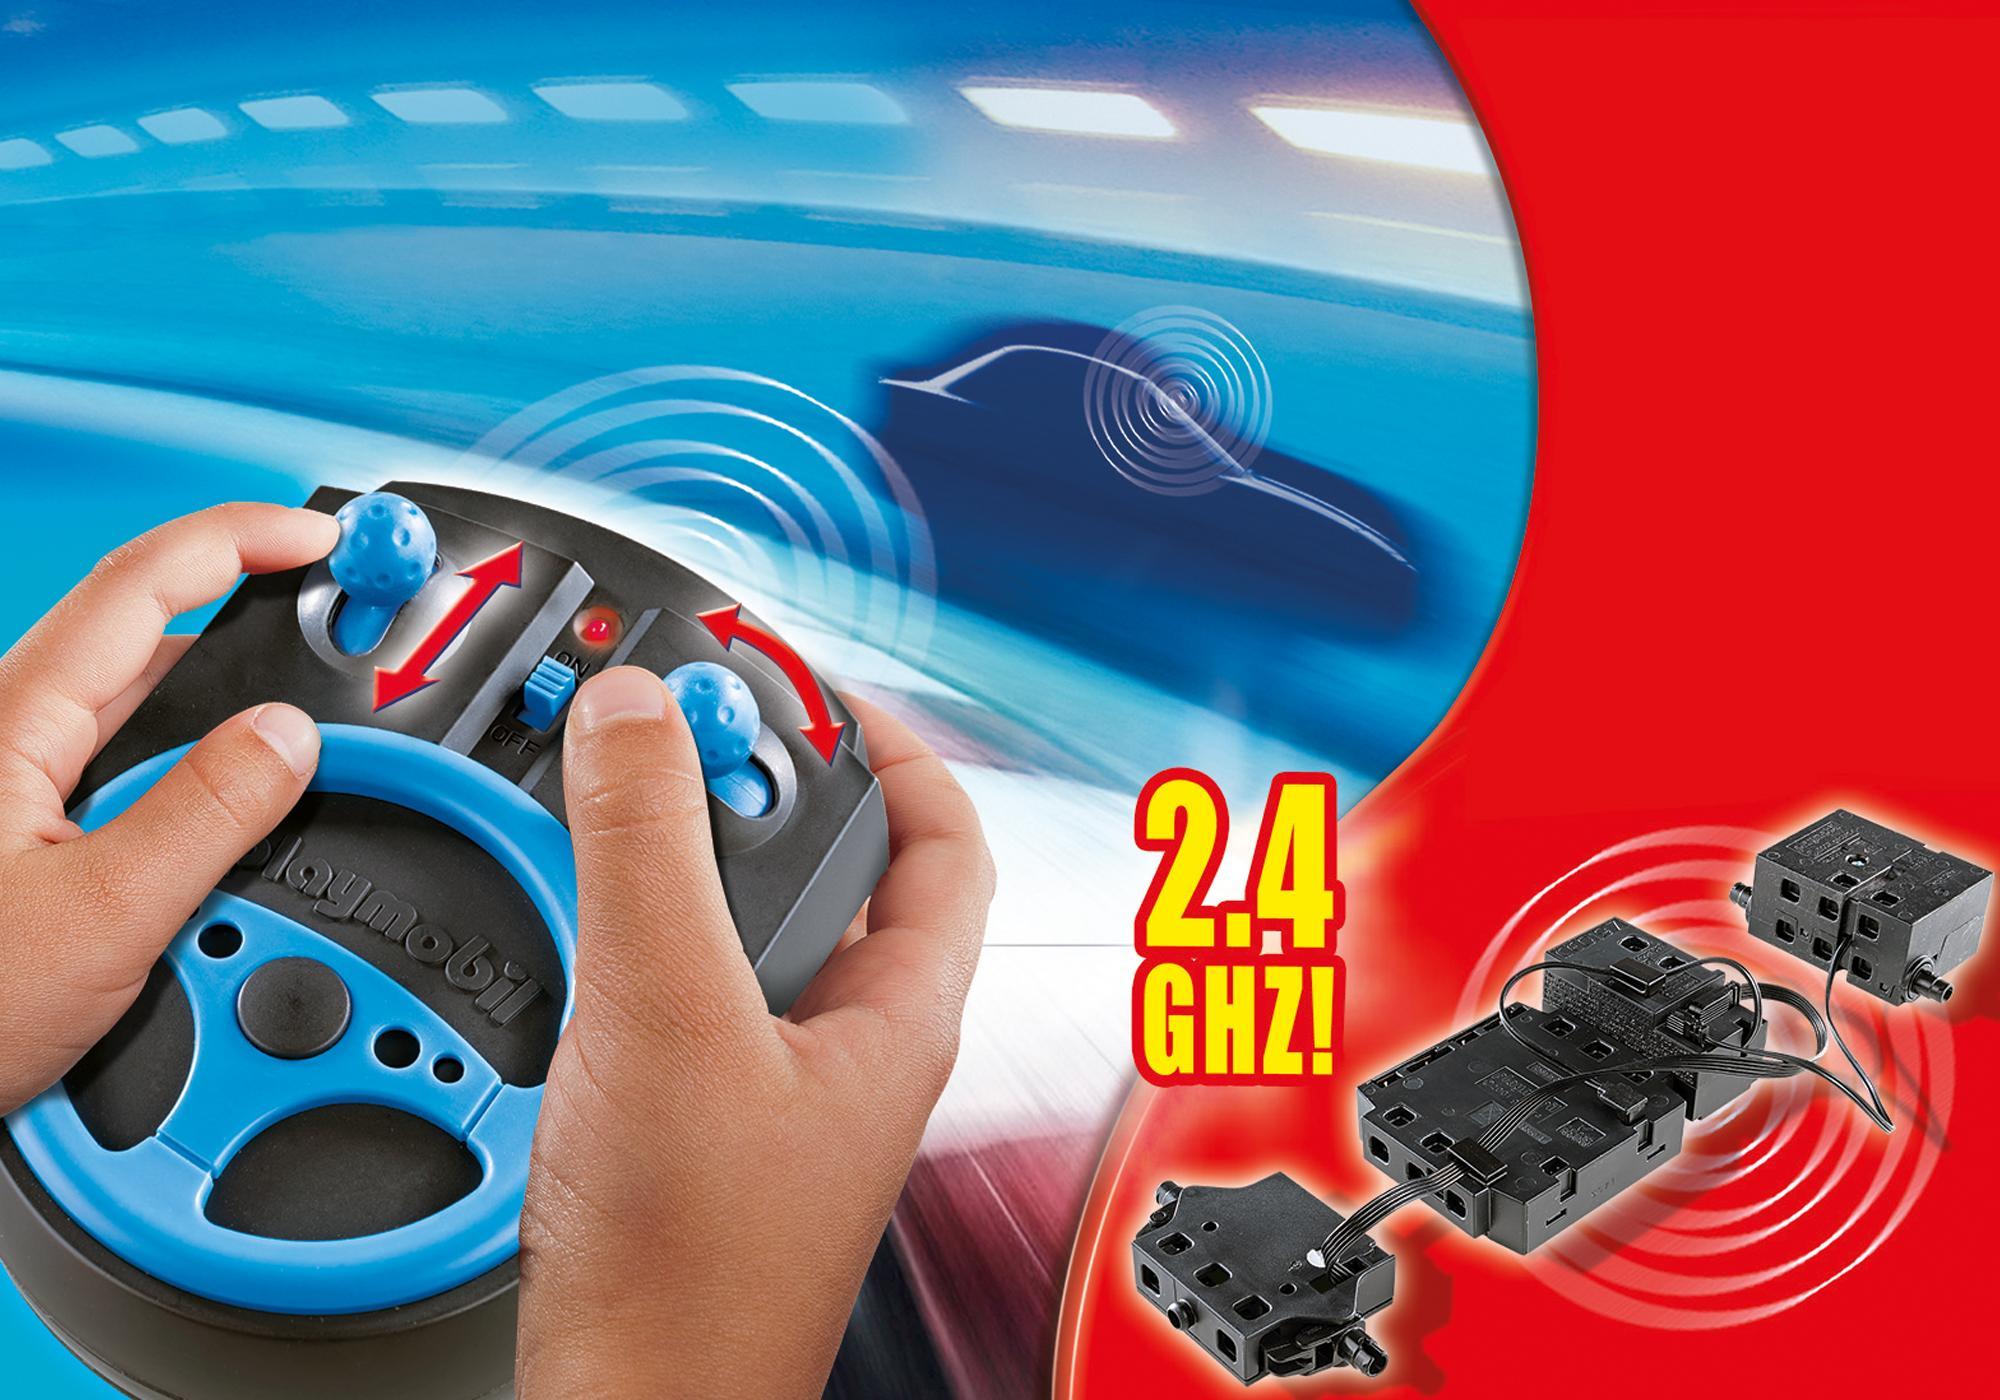 http://media.playmobil.com/i/playmobil/6914_product_detail/RC-Modul-Set 2,4 GHz